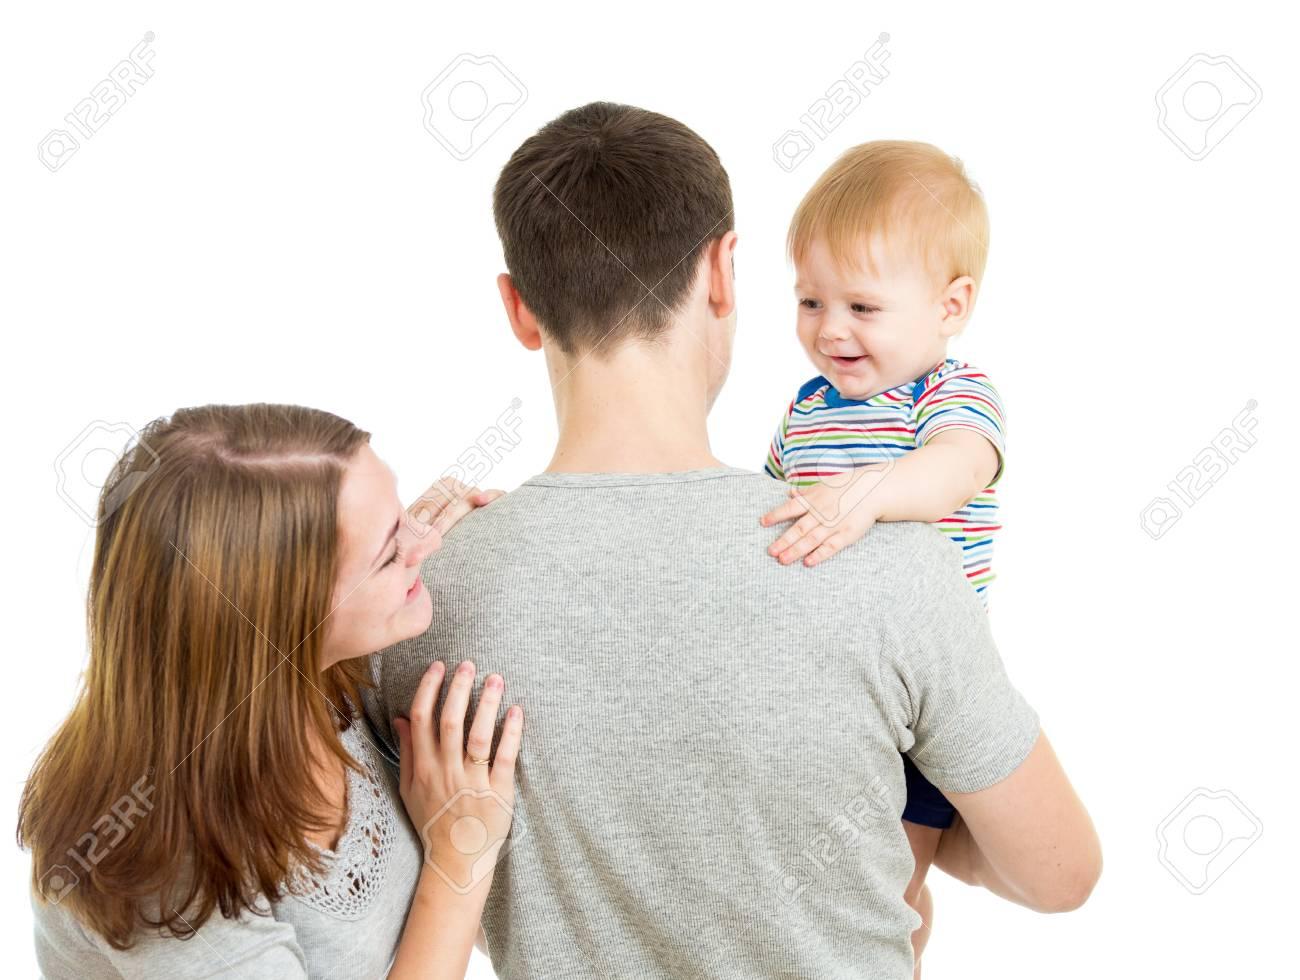 Happy family isolated on white background Stock Photo - 16521632